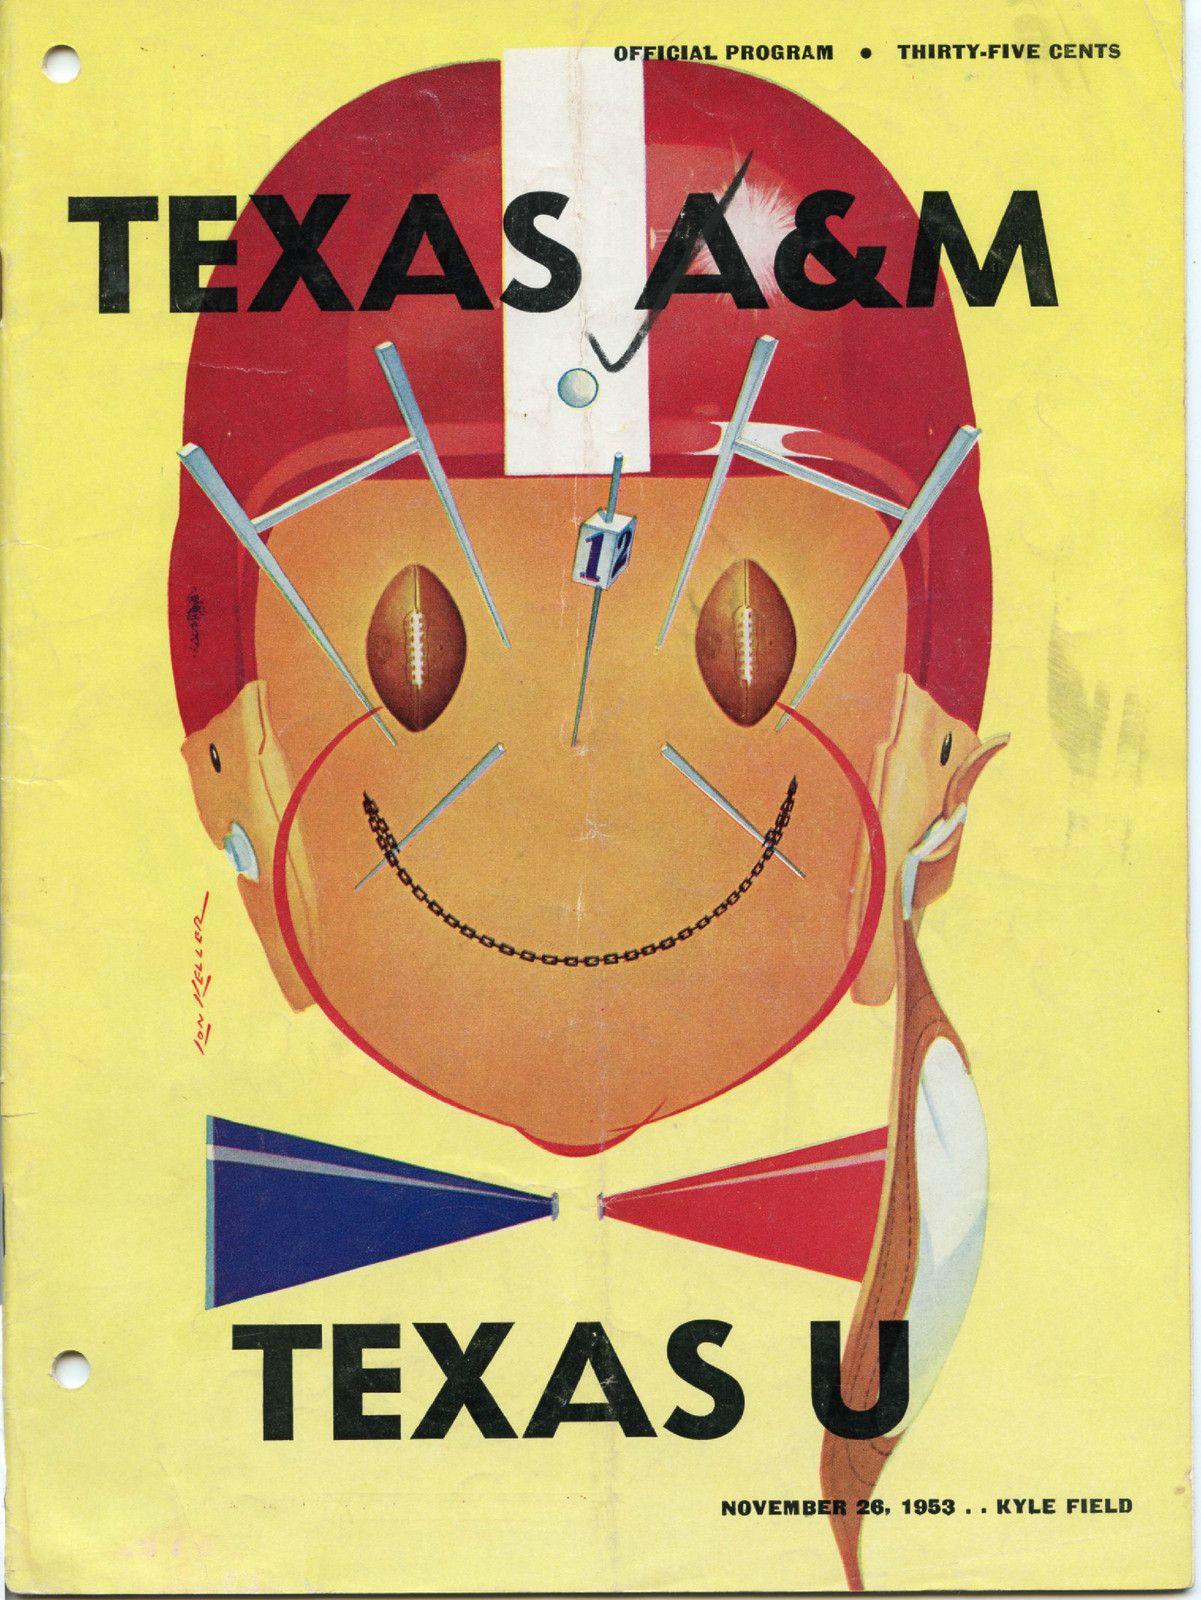 1953 Game Program between Texas A & M vs University of